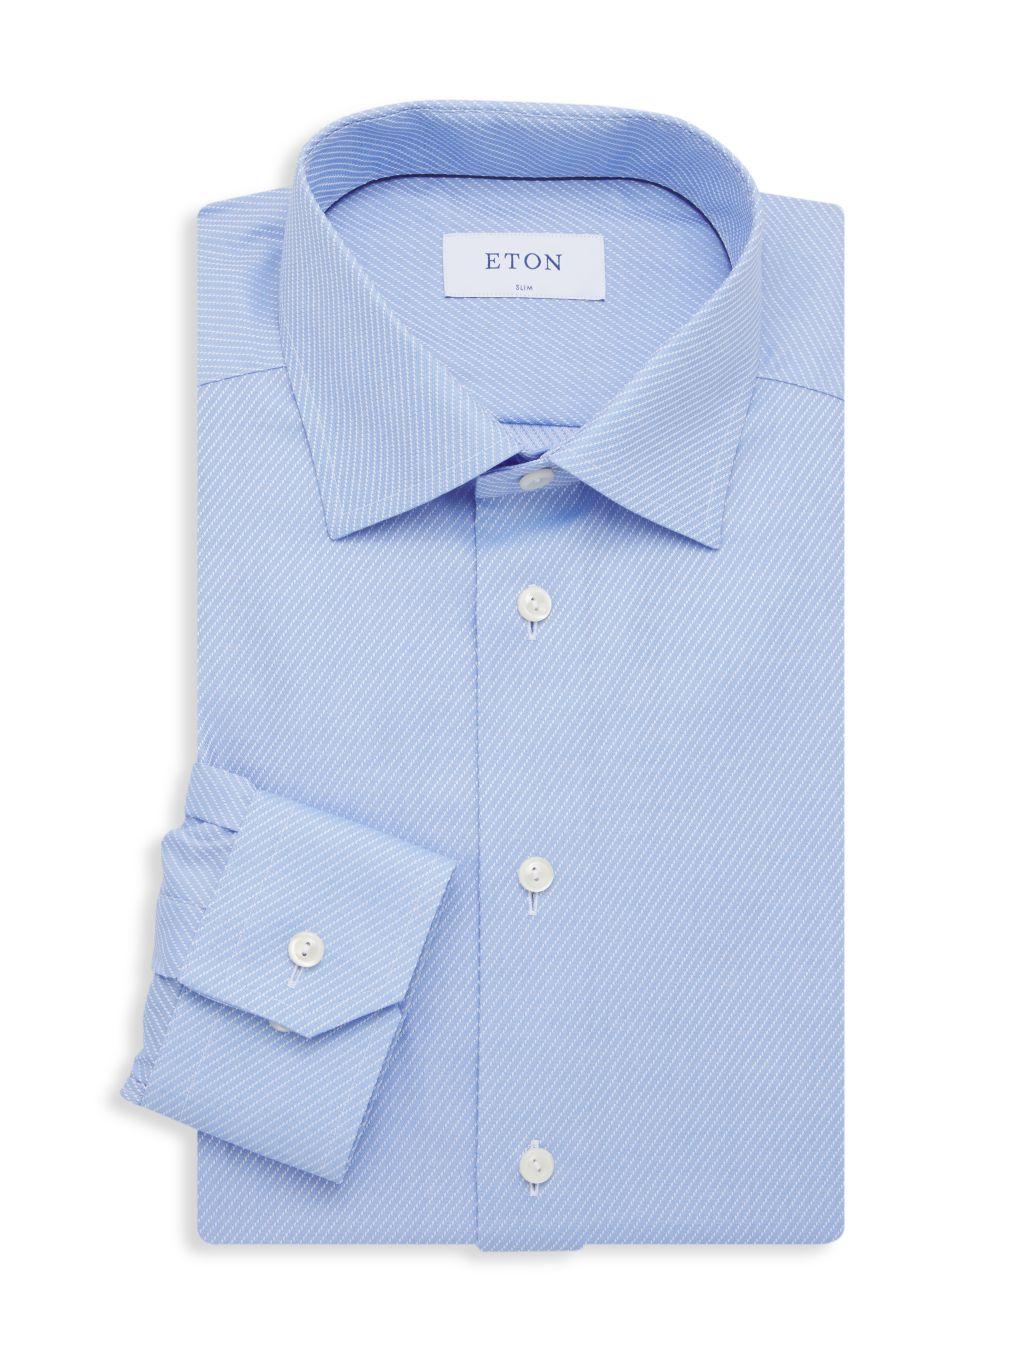 Eton Broken Stripe Dress Shirt